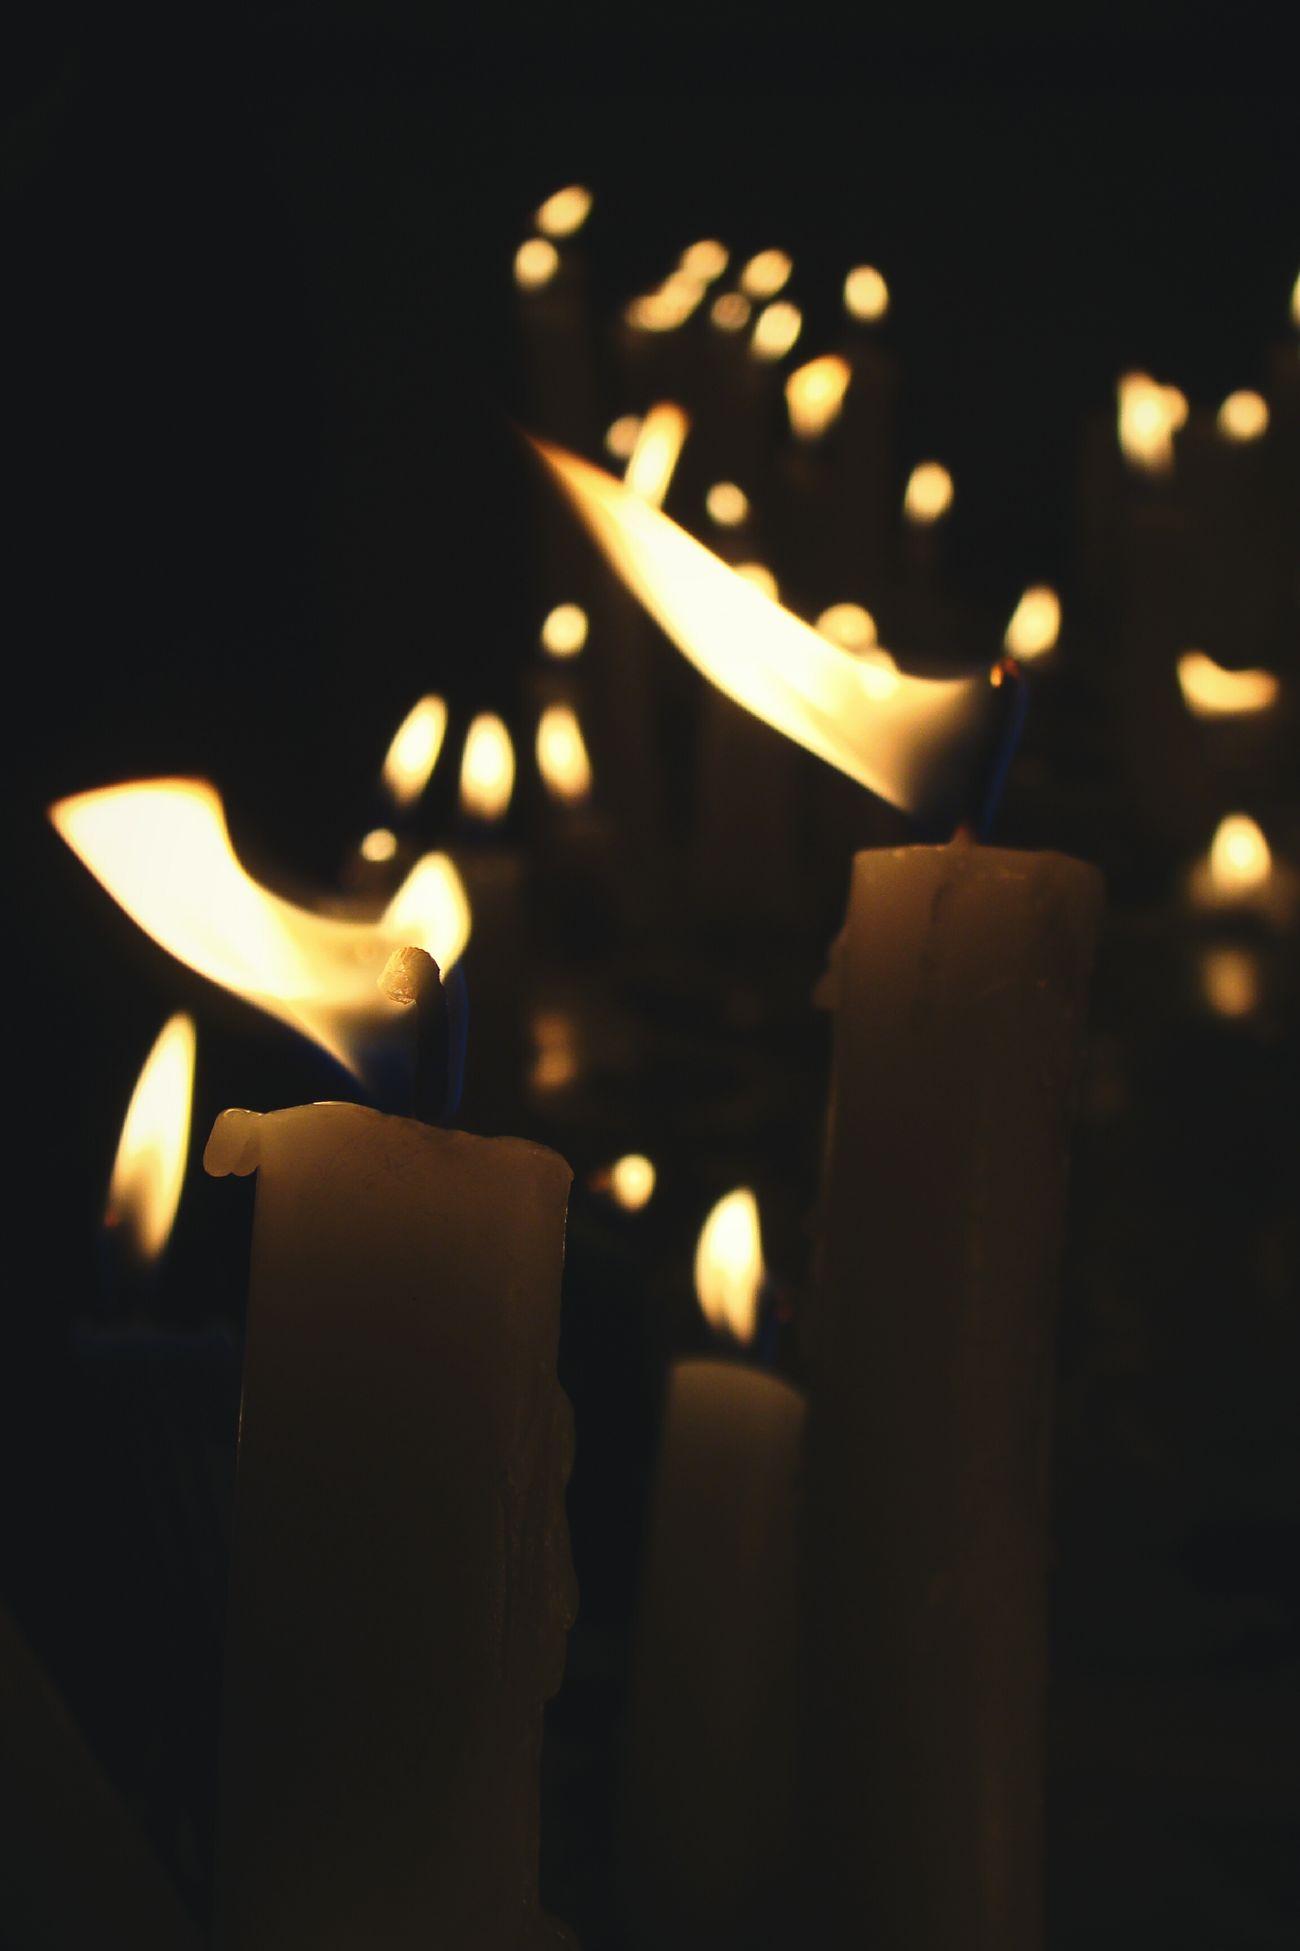 Liberate Velas Fuego Much Mucho Fuego Yellow Llamas Illuminated Flame Burning Candle Shiny Heat - Temperature No People Llama Iglesia Iglesia Del Cisne